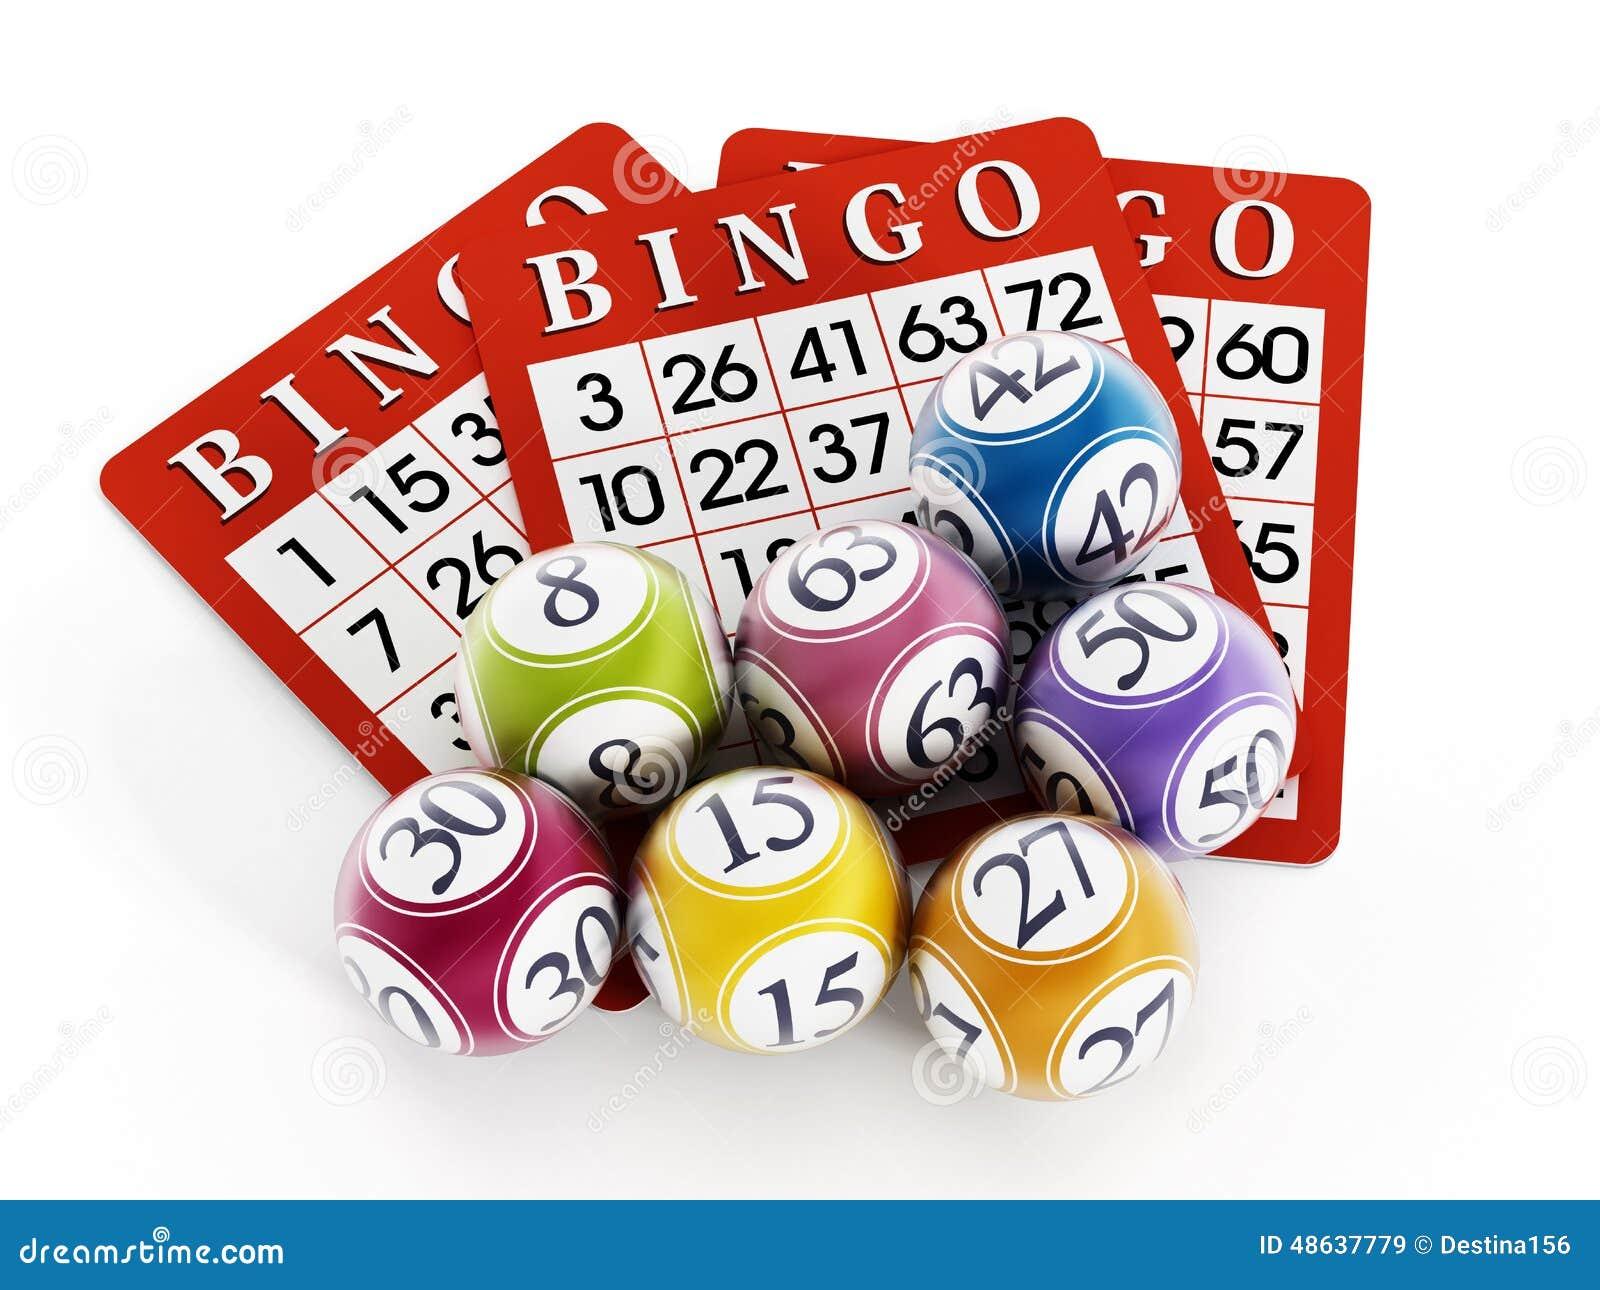 Wie Geht Bingo